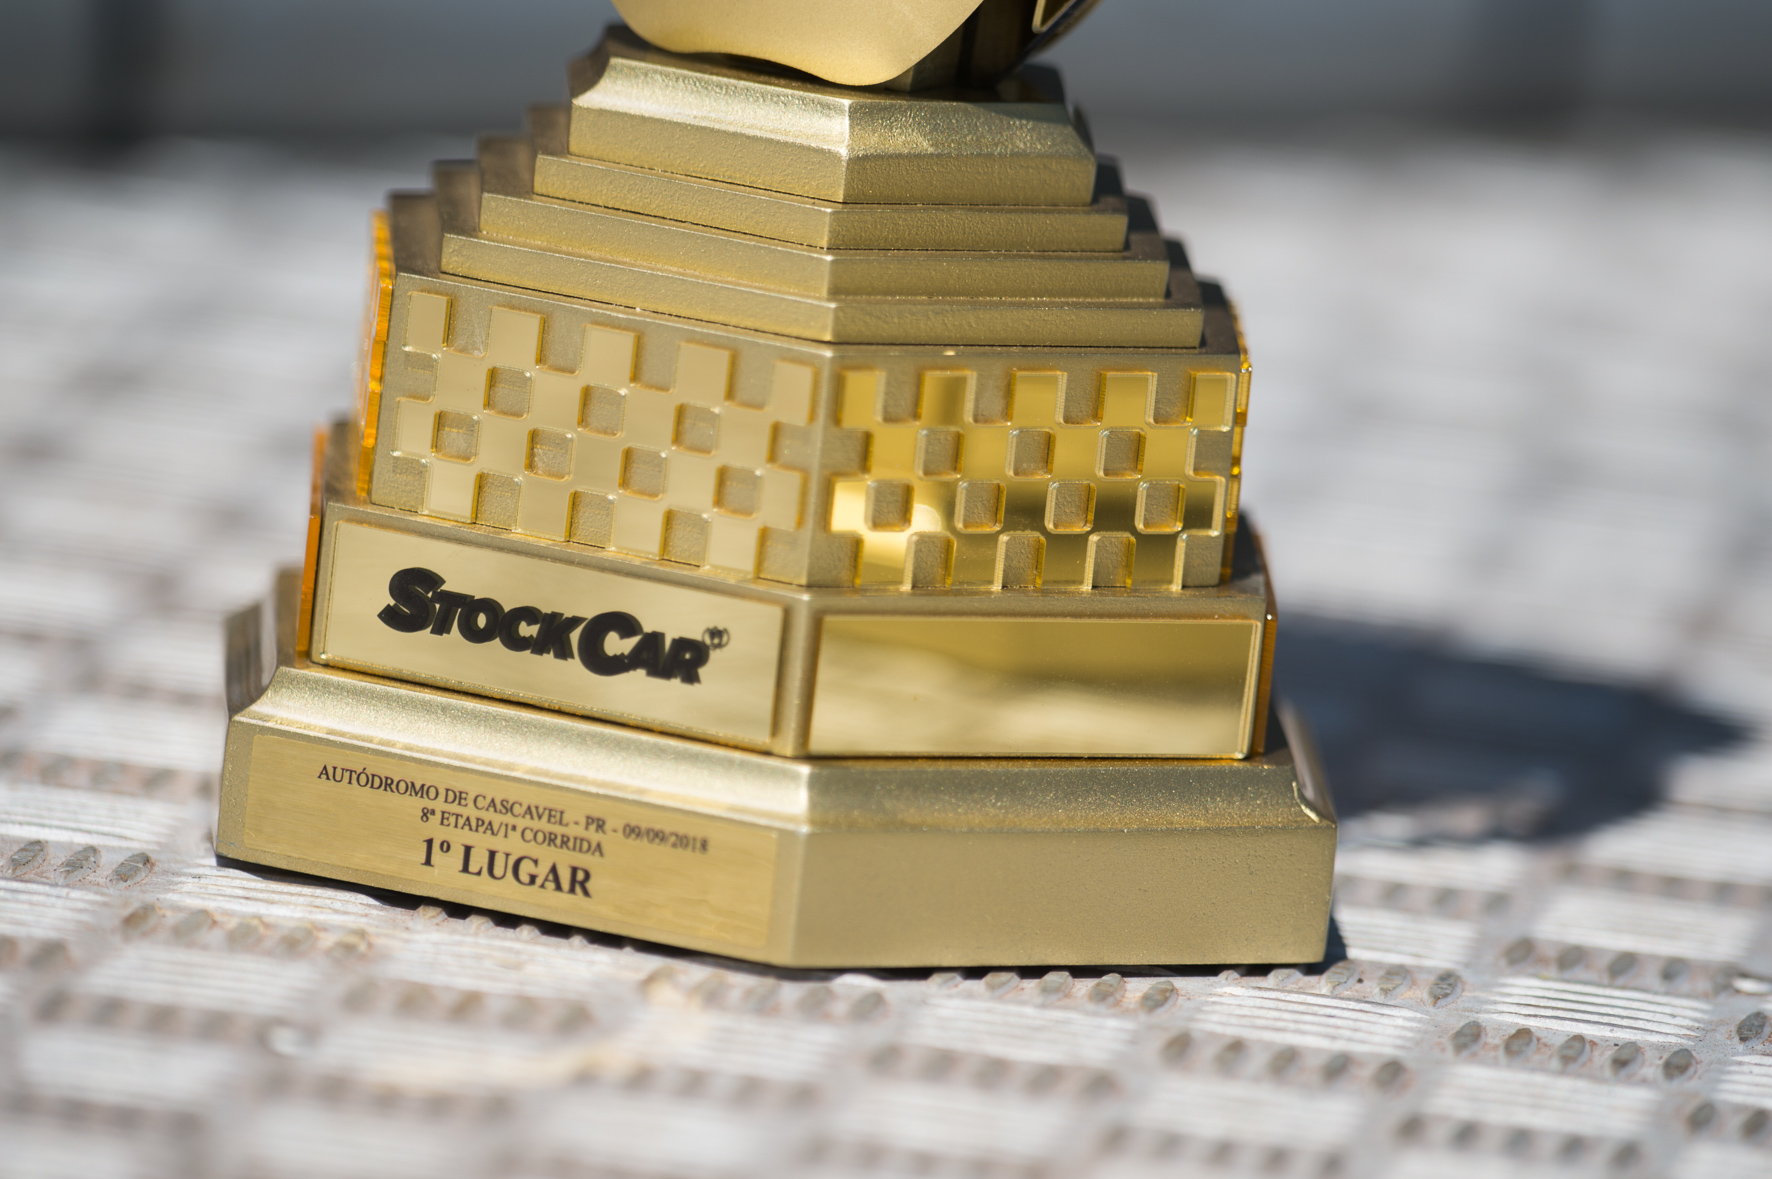 StockCar2018_dudabairros_Cascavel-43705.